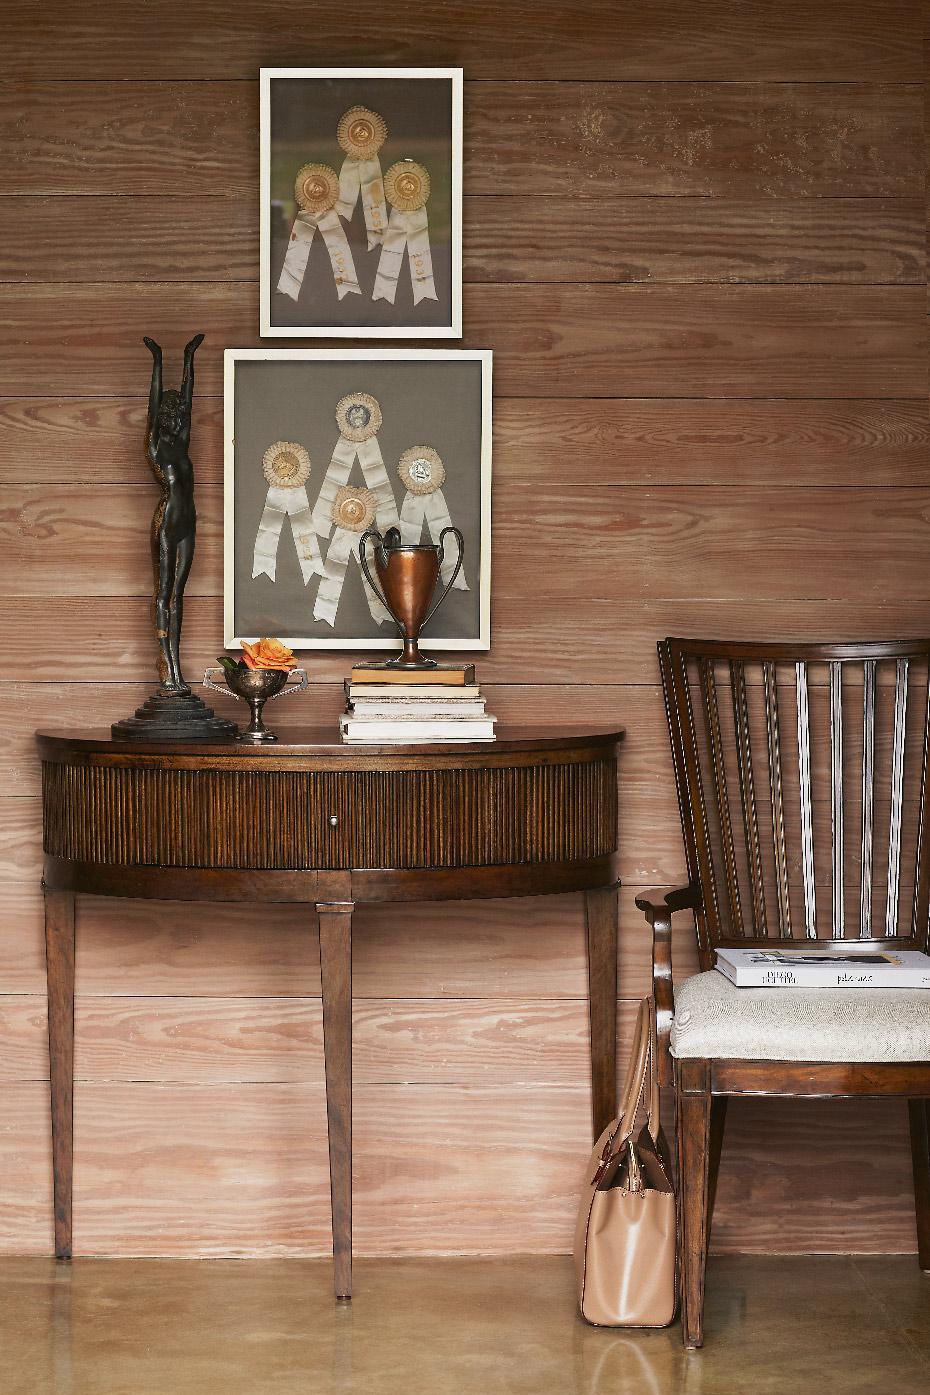 Stacey Van Berkel Photography I Equestrian Interior I Entryway I Bernhardt Furniture